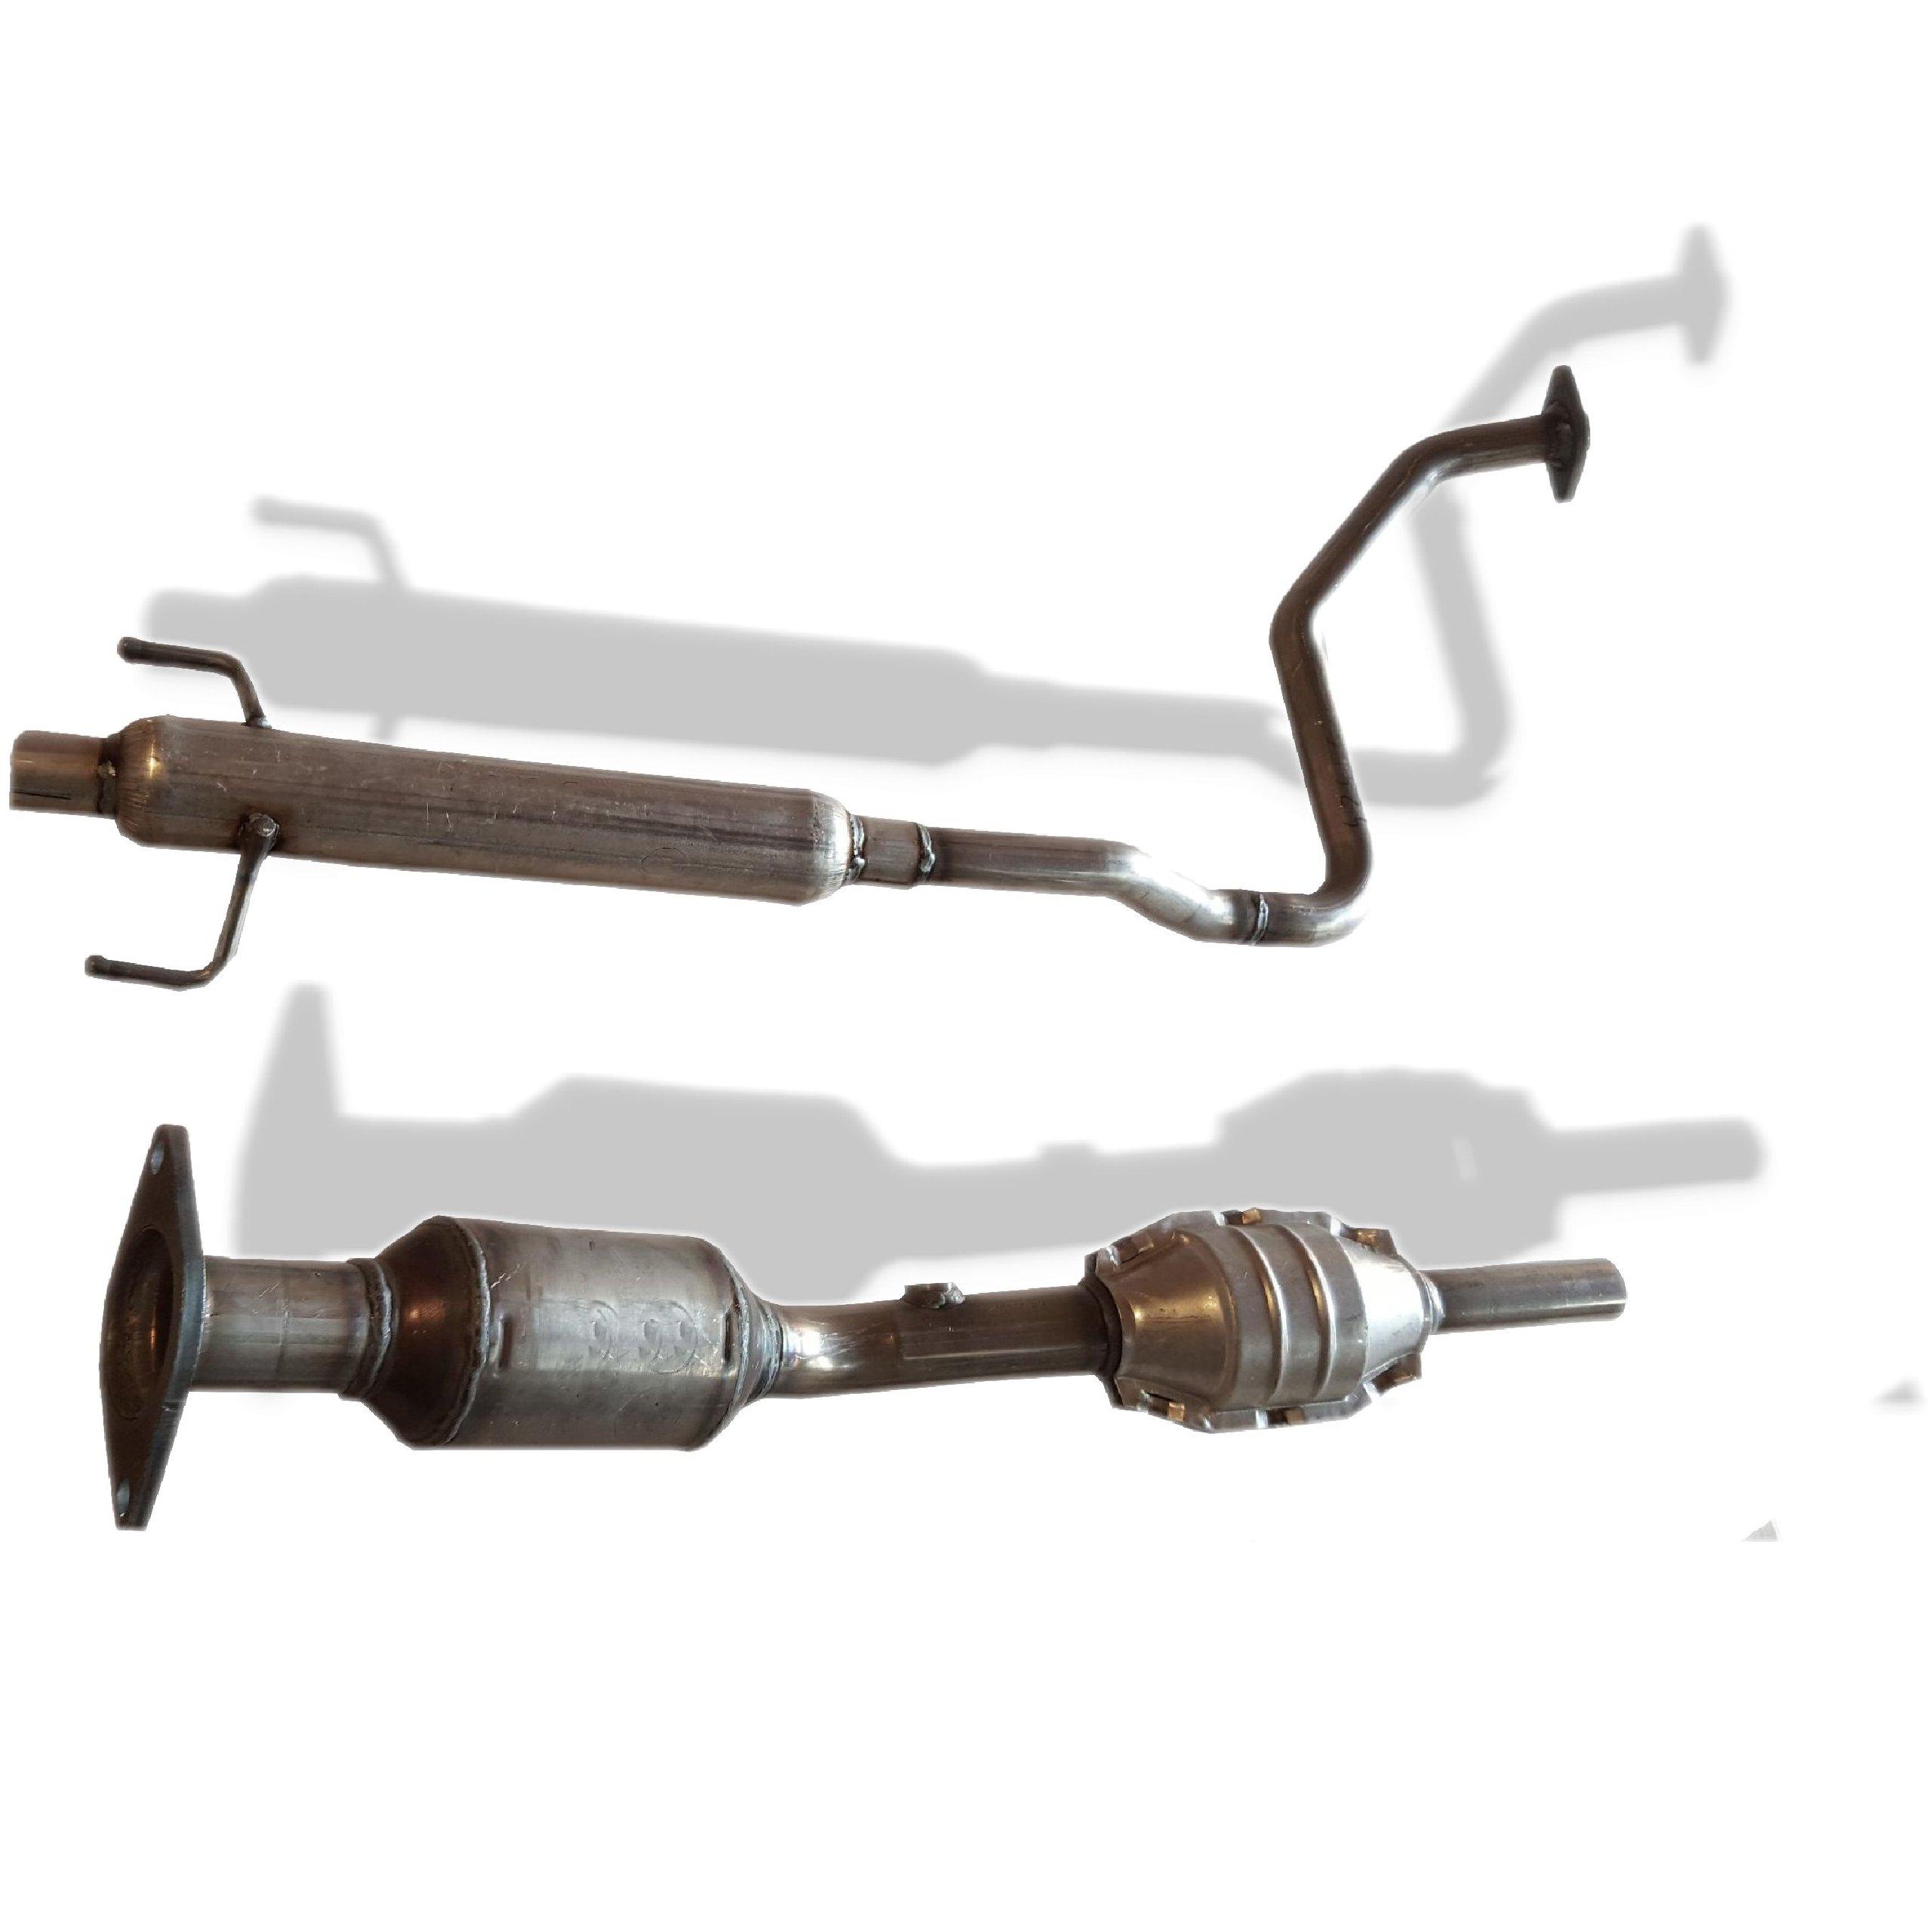 катализатор toyota prius 15i 16v 1nz-fxe 112003